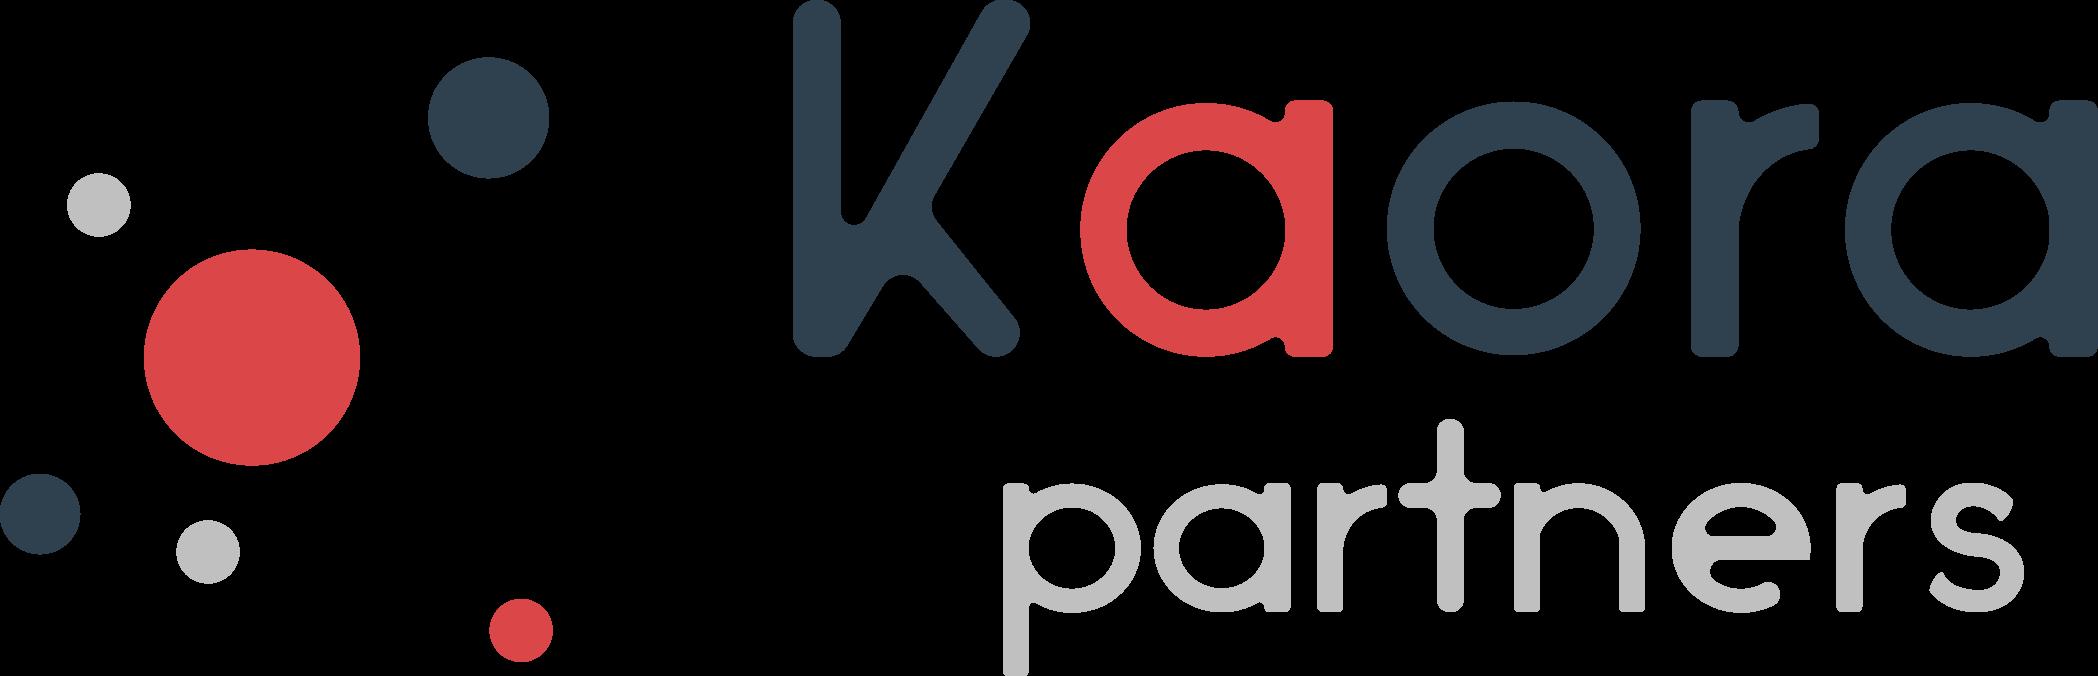 kaora partners pickyourskills staffing collaboration